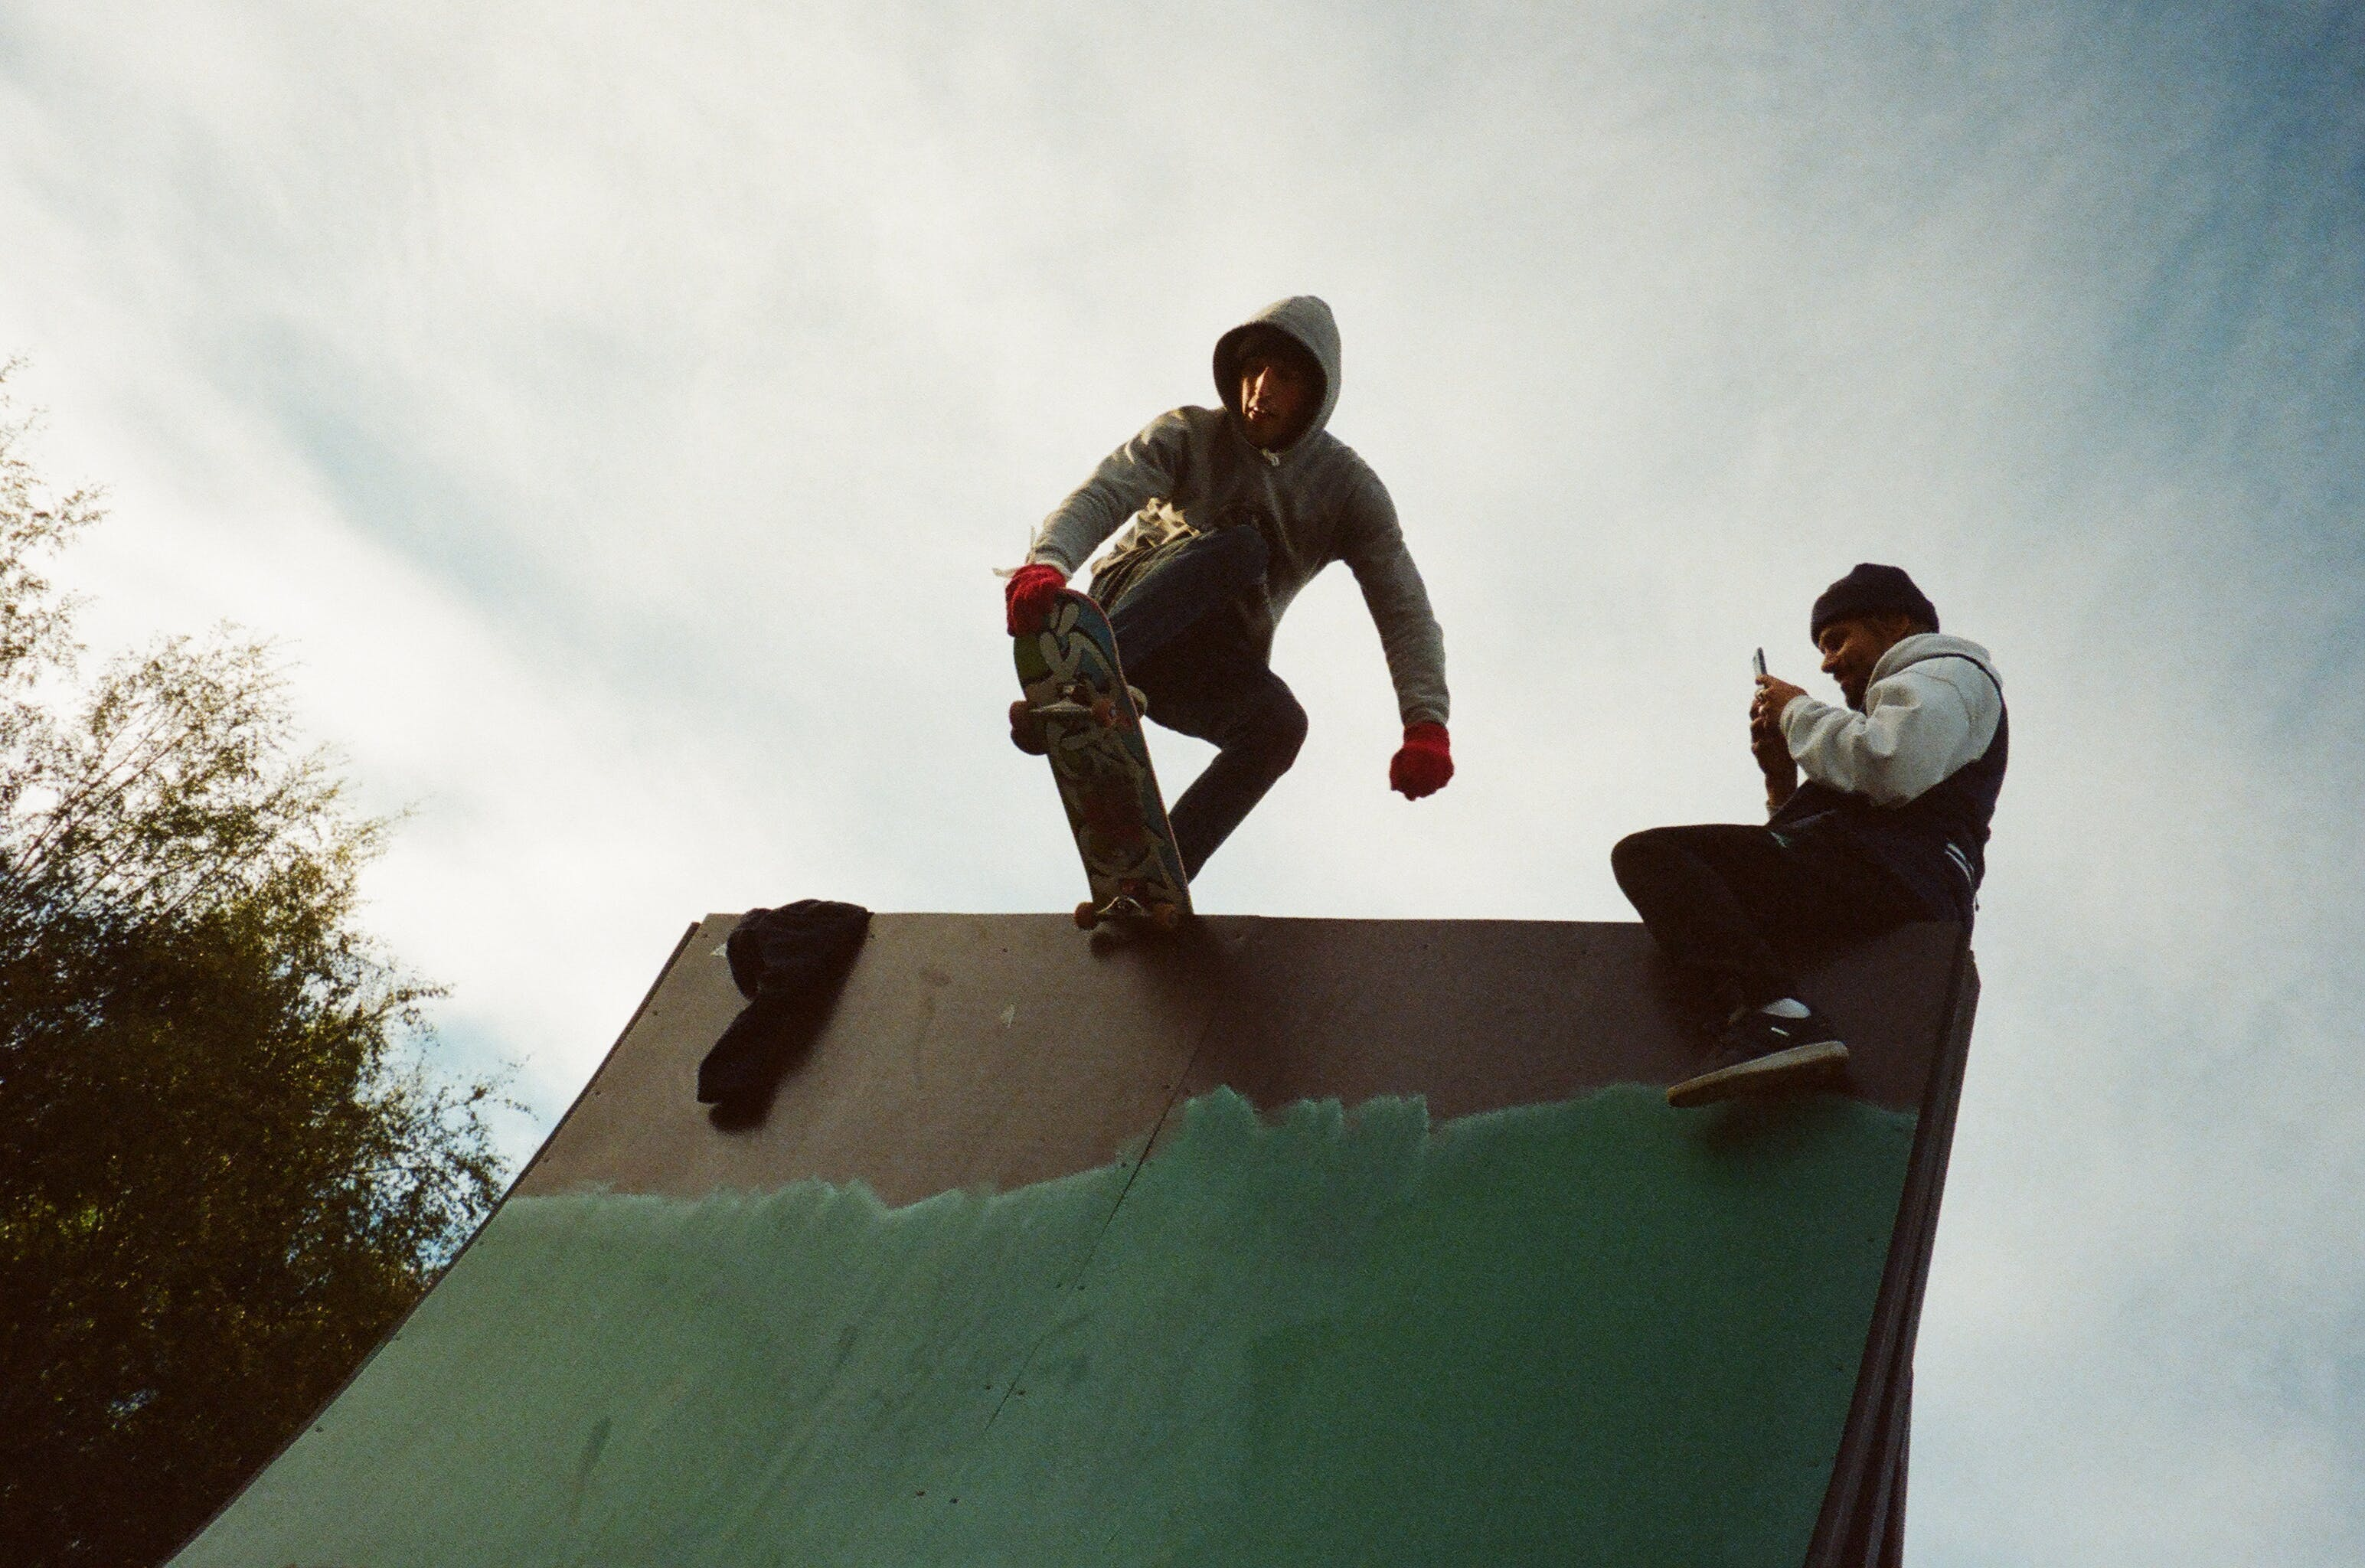 Photo of a Man Skateboarding